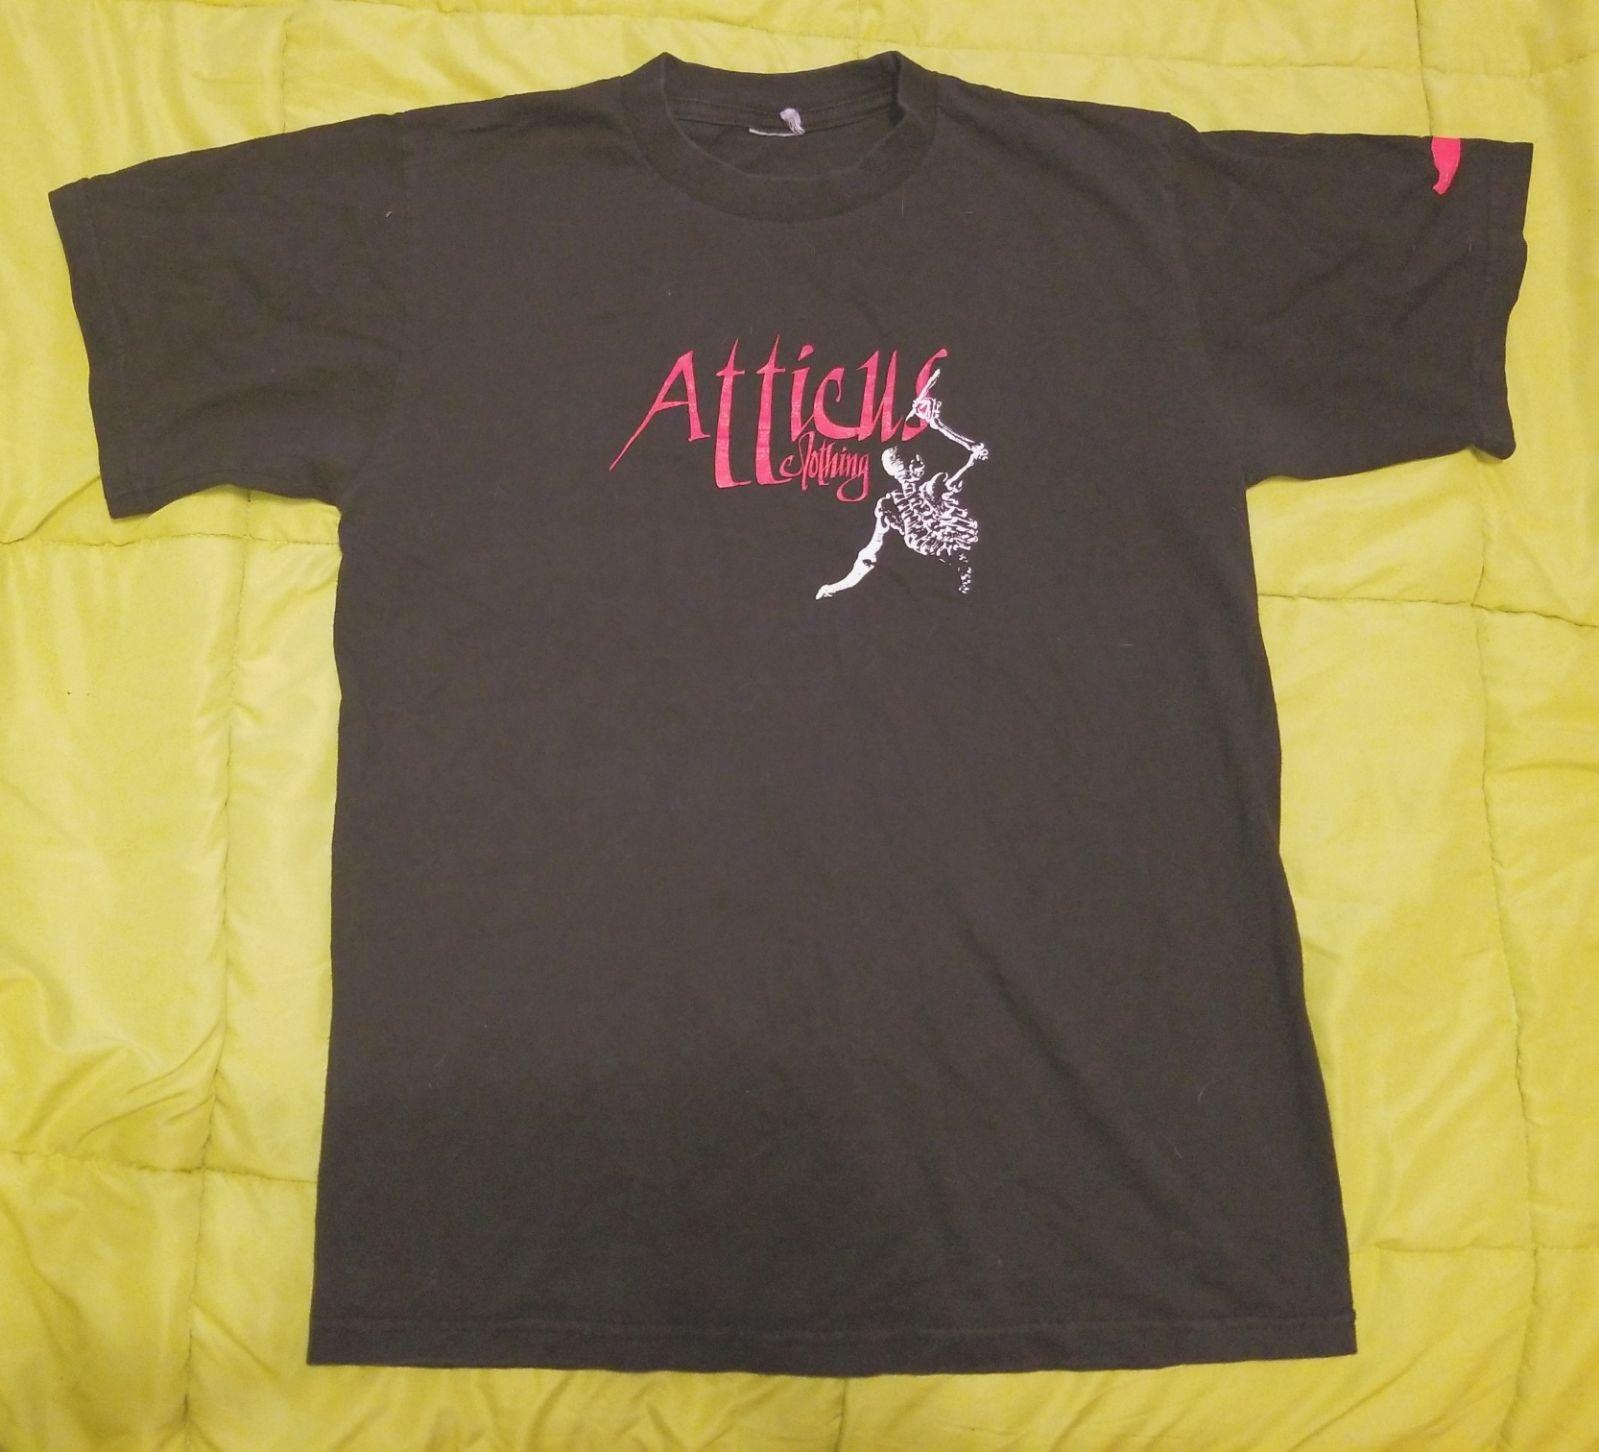 Atticus Clothing Mens Sz M FREE SHIPPING